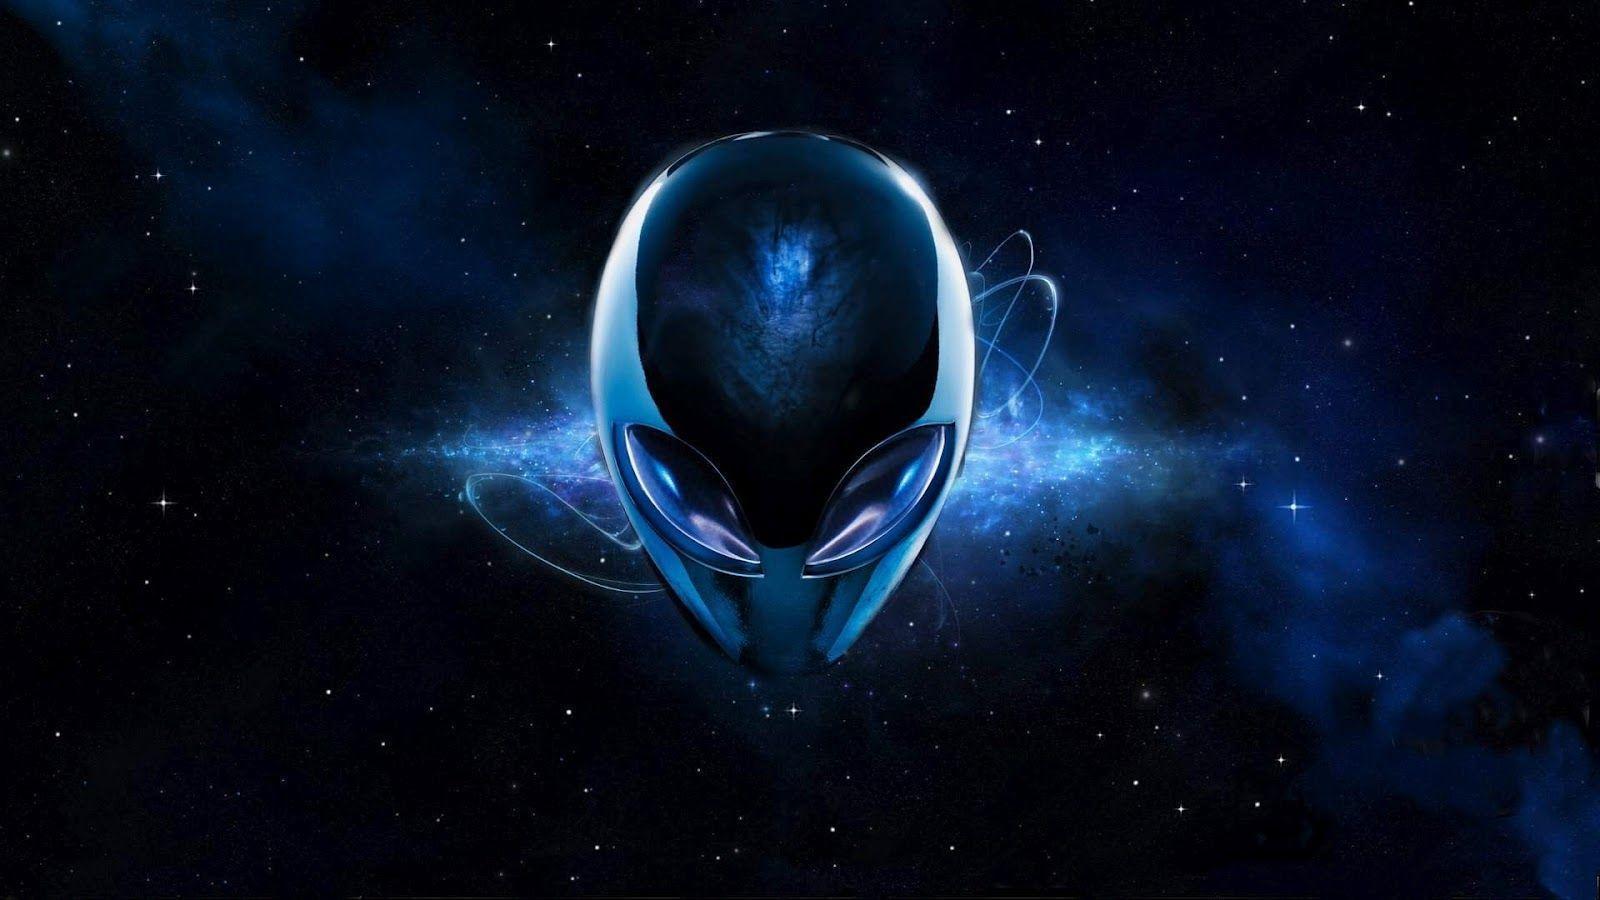 Alien Planet Wallpaper Wallpaper Hd Wallpaper Background Desktop